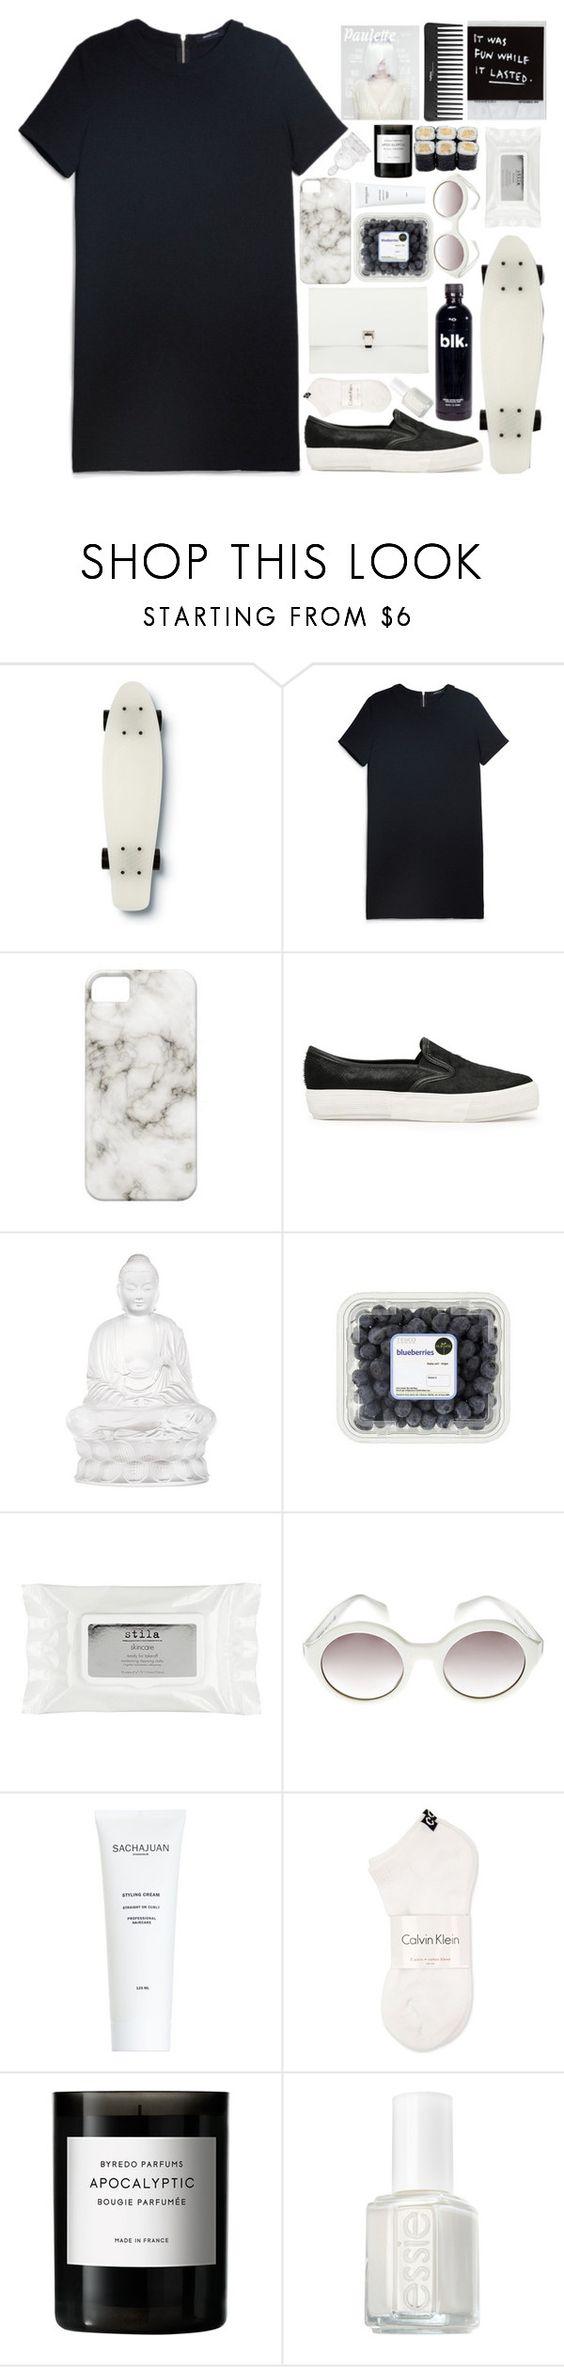 """Acèni"" by daniaindria ❤ liked on Polyvore featuring Quiksilver, MANGO, Lalique, Sephora Collection, Stila, Prada, J.Crew, Calvin Klein, Byredo and Essie"